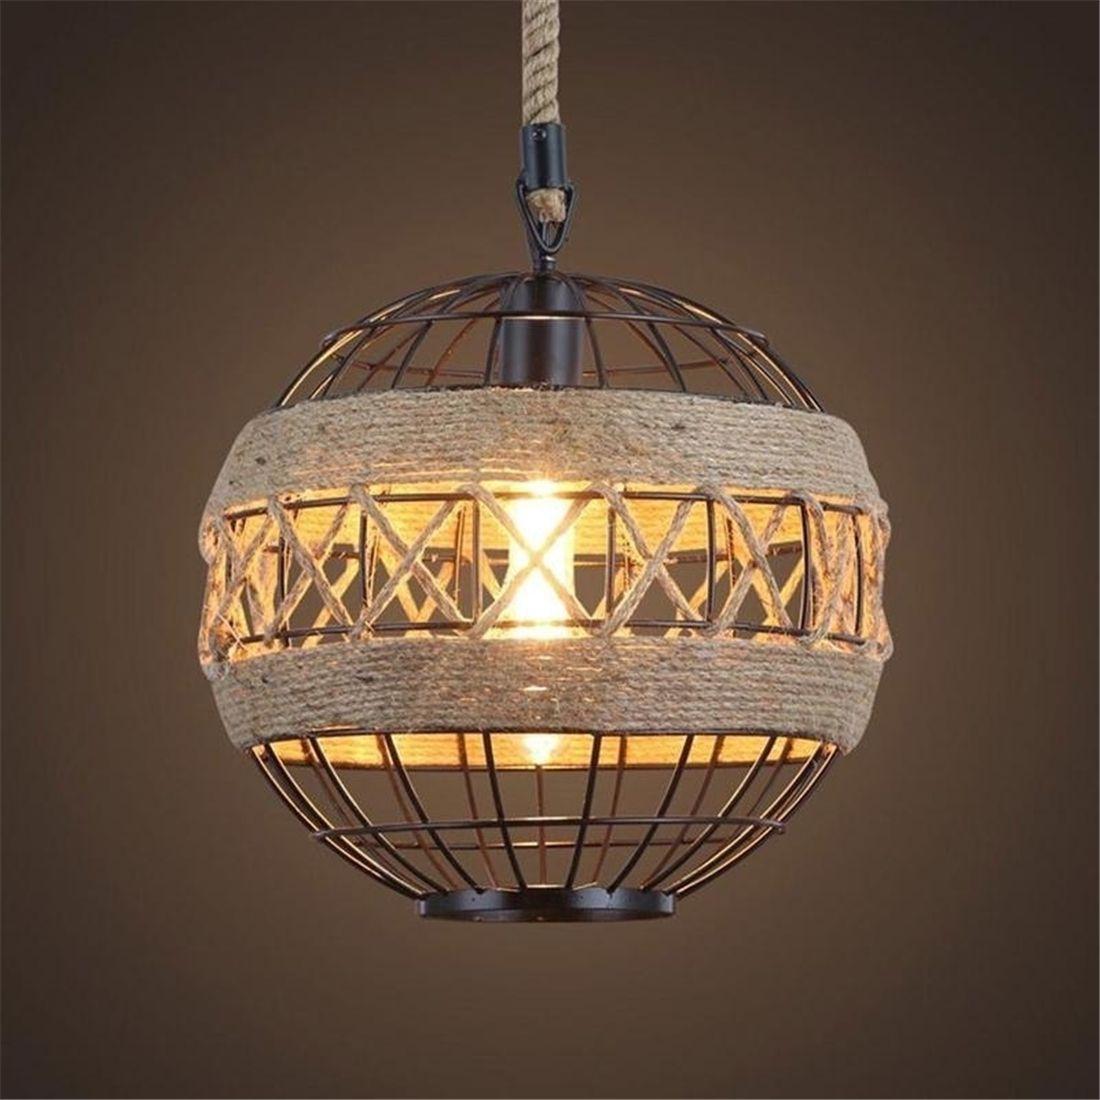 E27 Led light retro rope industrial wind chandelier for Internet cafe restaurant cafe bar ball personalized lamp european rural bird marble hemp rope chandelier cafe restaurant corridor balcony chandelier size 33 38cm e27 ac110 240v